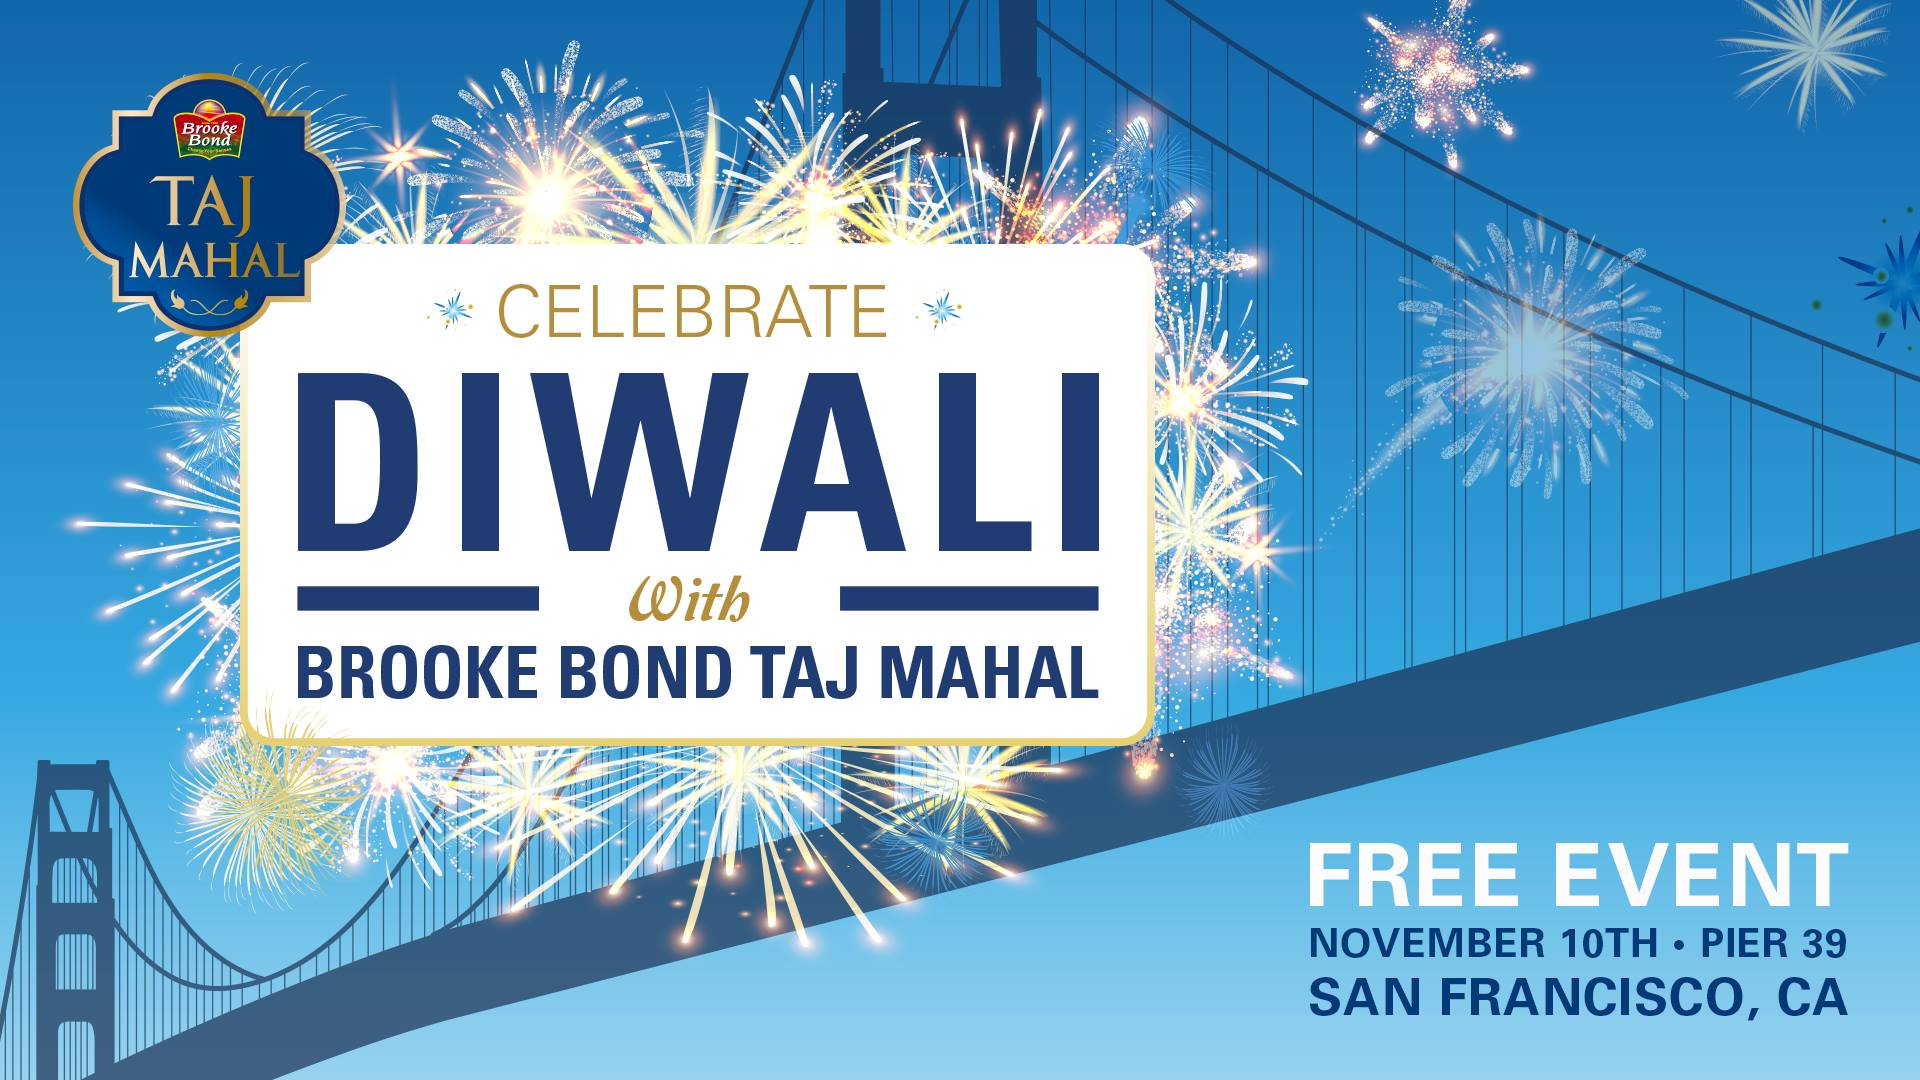 Celebrate Diwali with Brooke Bond Taj Mahal